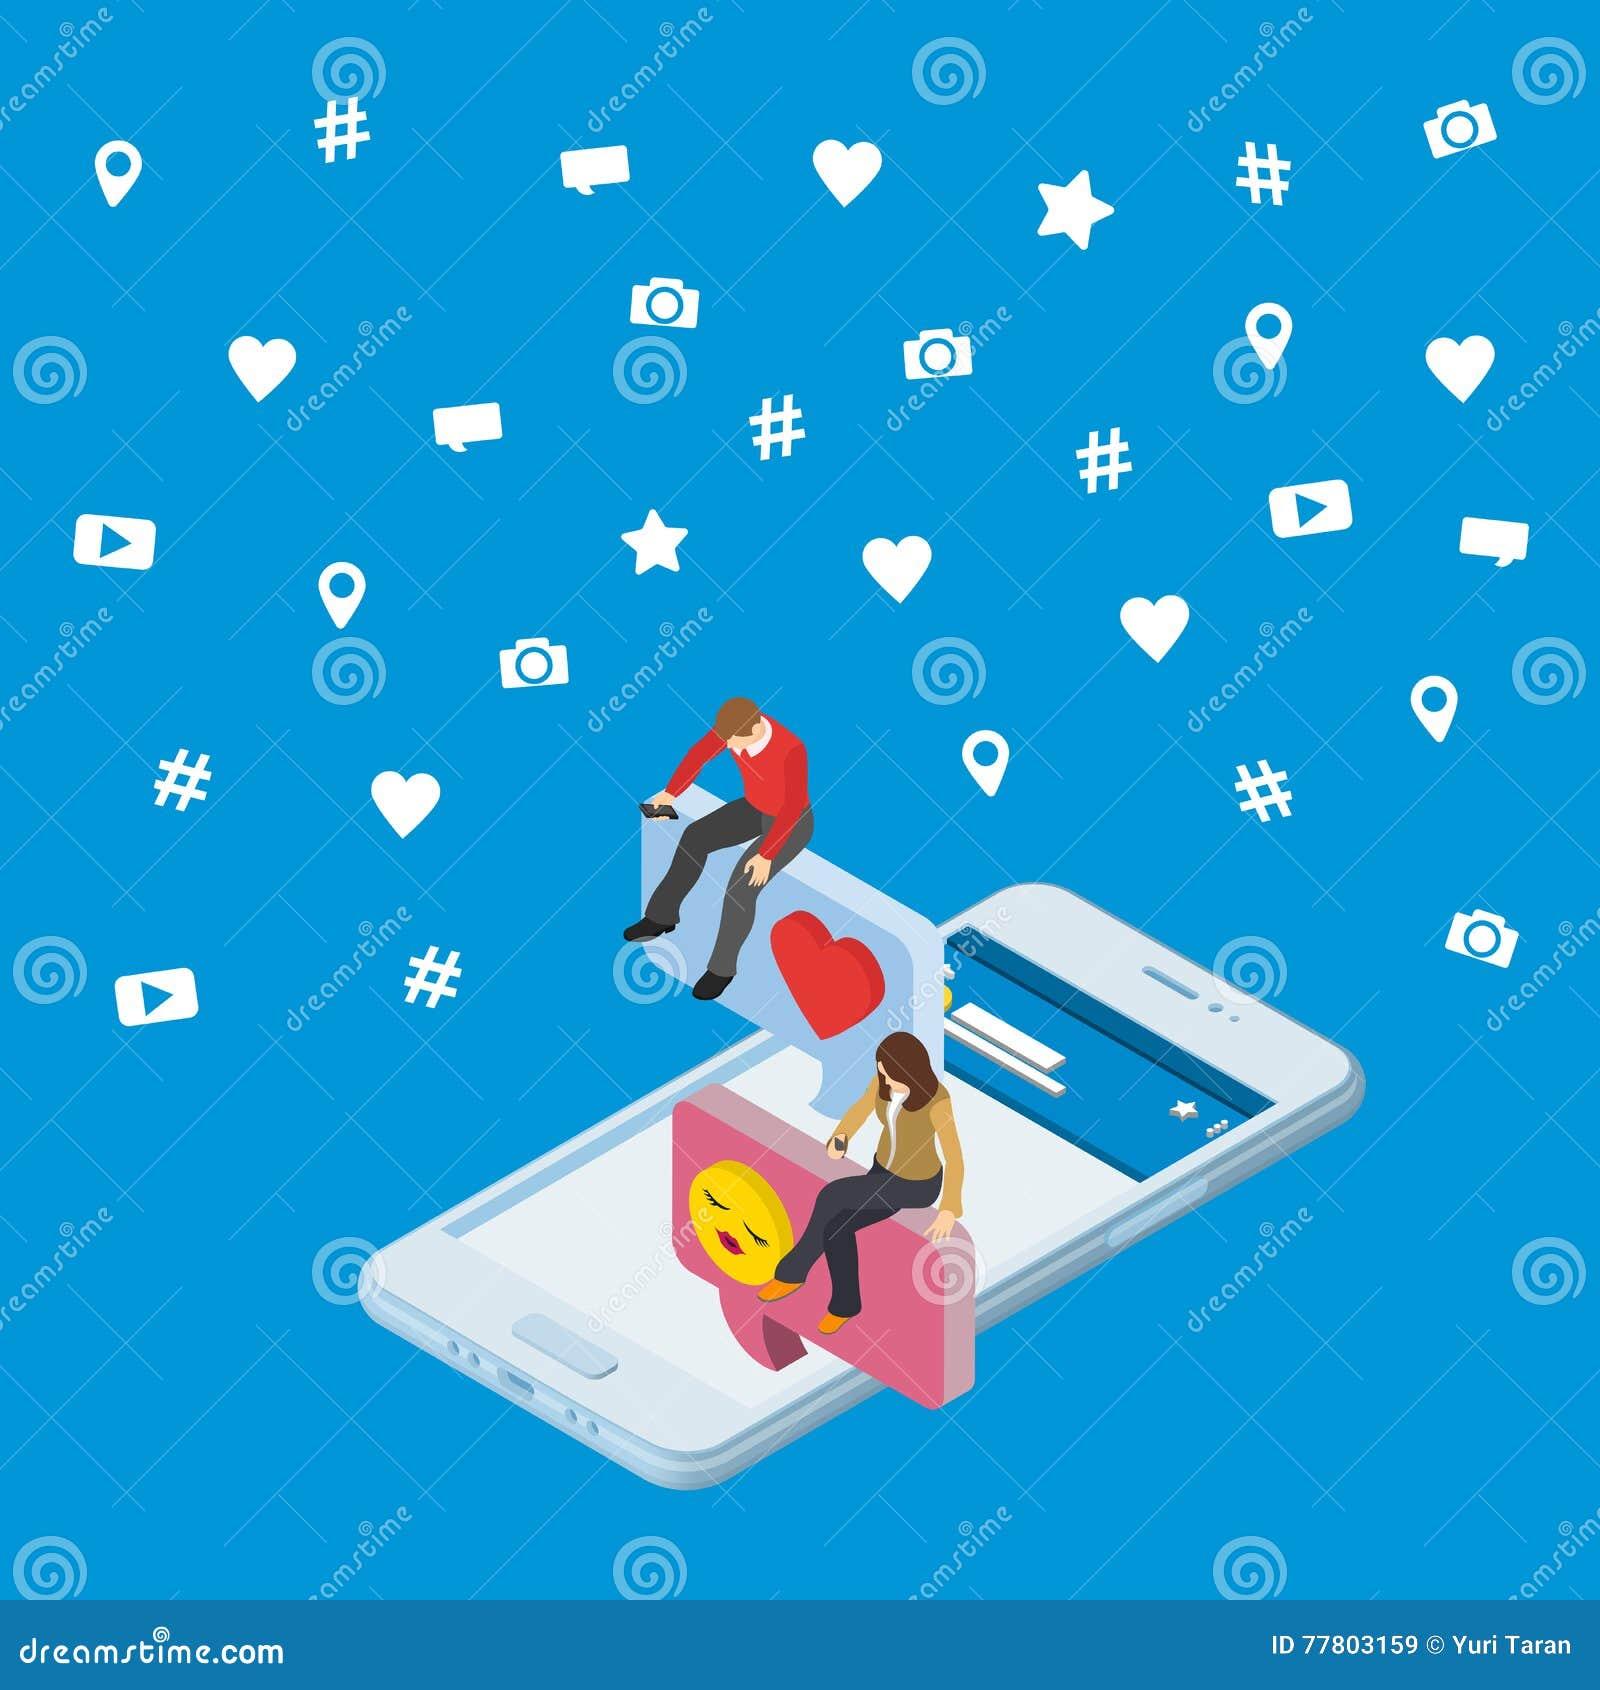 Marketing online dating